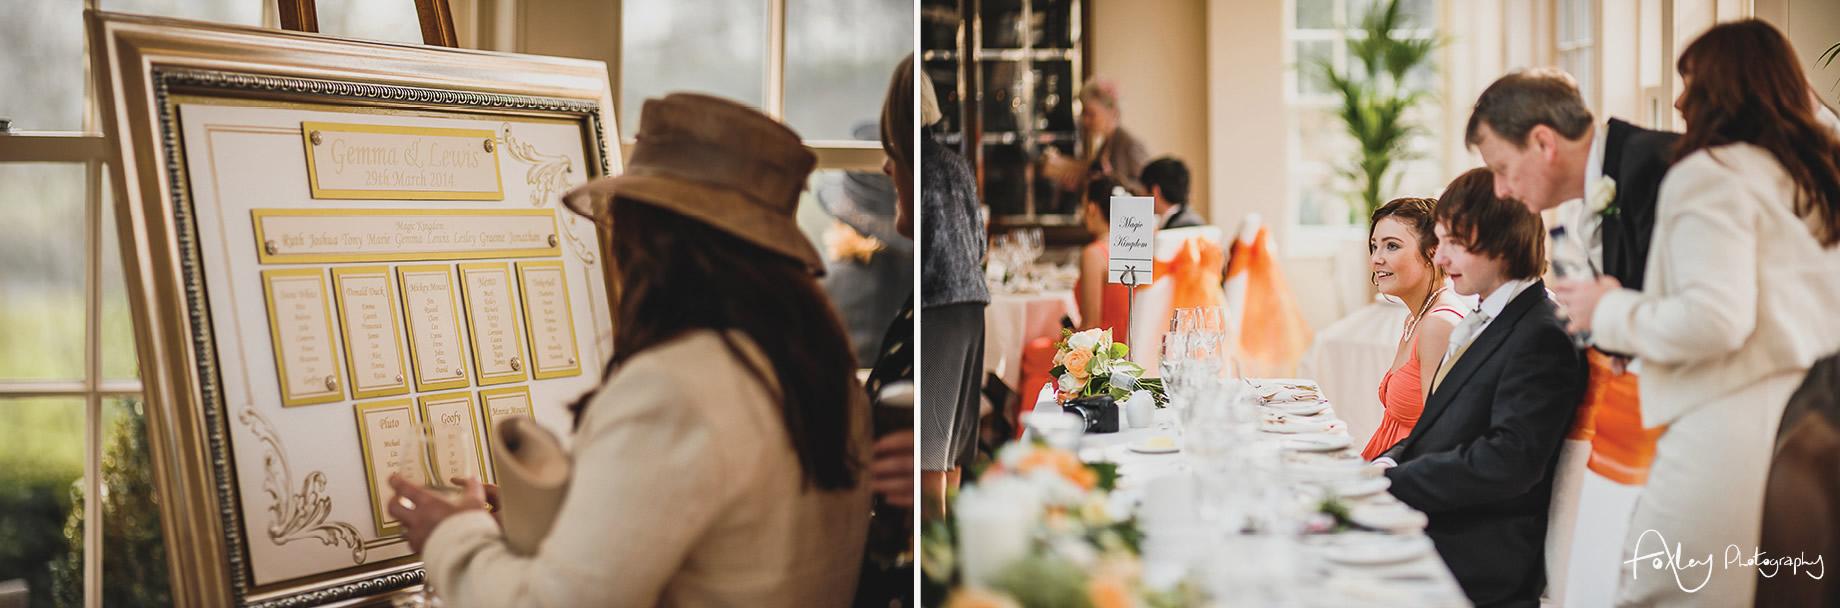 Gemma and Lewis' Wedding at Mitton Hall 123